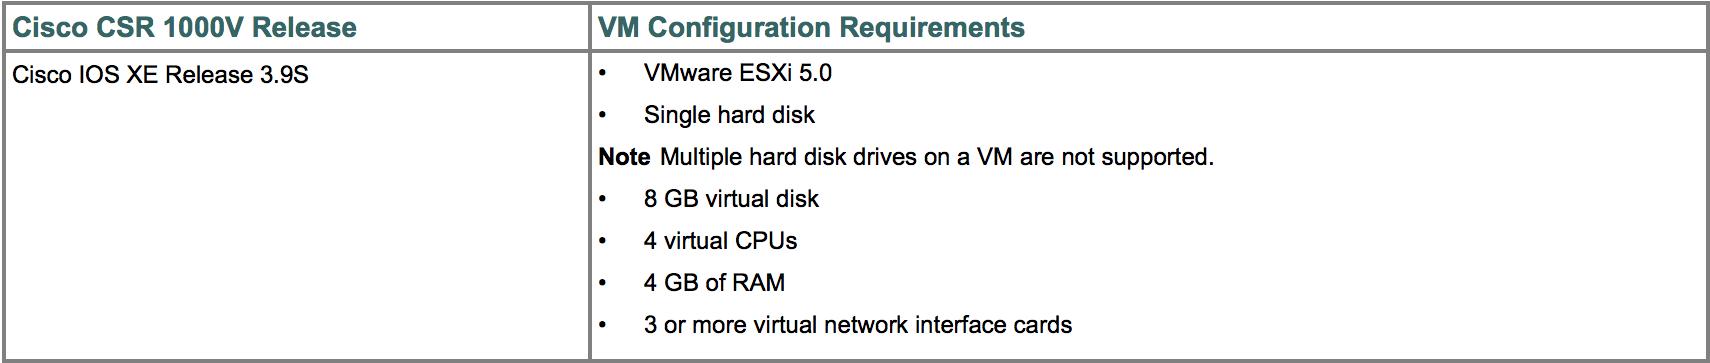 Cisco CSR1000V vs the Fabled IOU - MovingPackets net